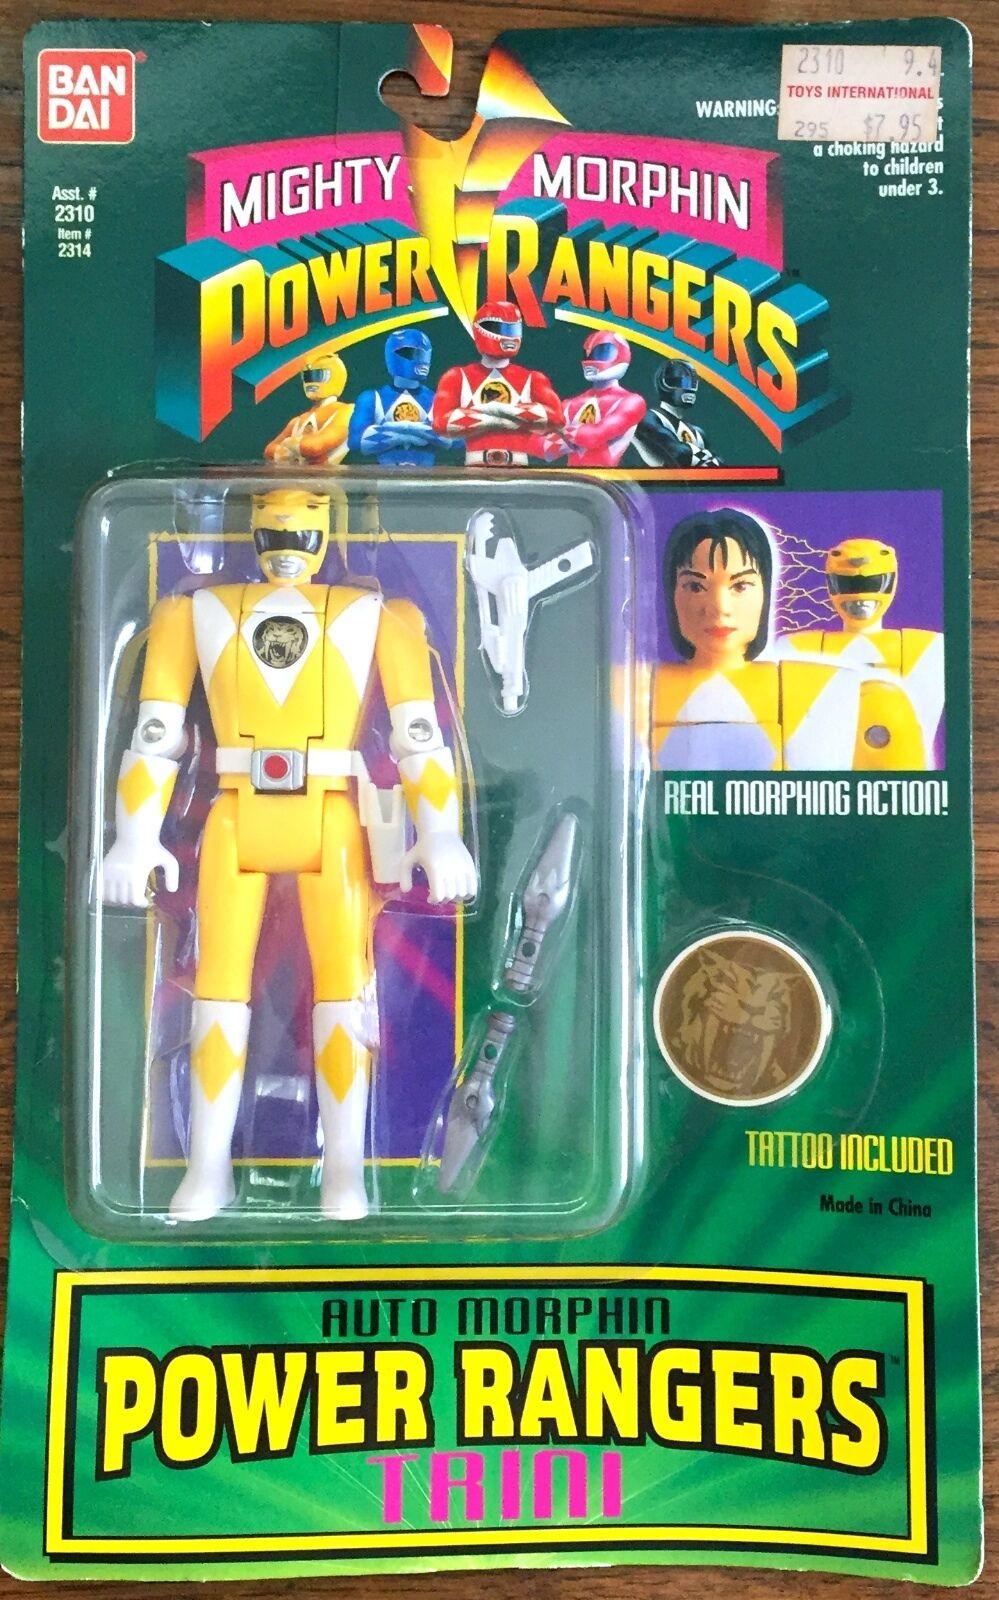 1994 Mighty Morphin Power Rangers Trini Toy Action Figure New, New, New, Bandai MOC 5e5006